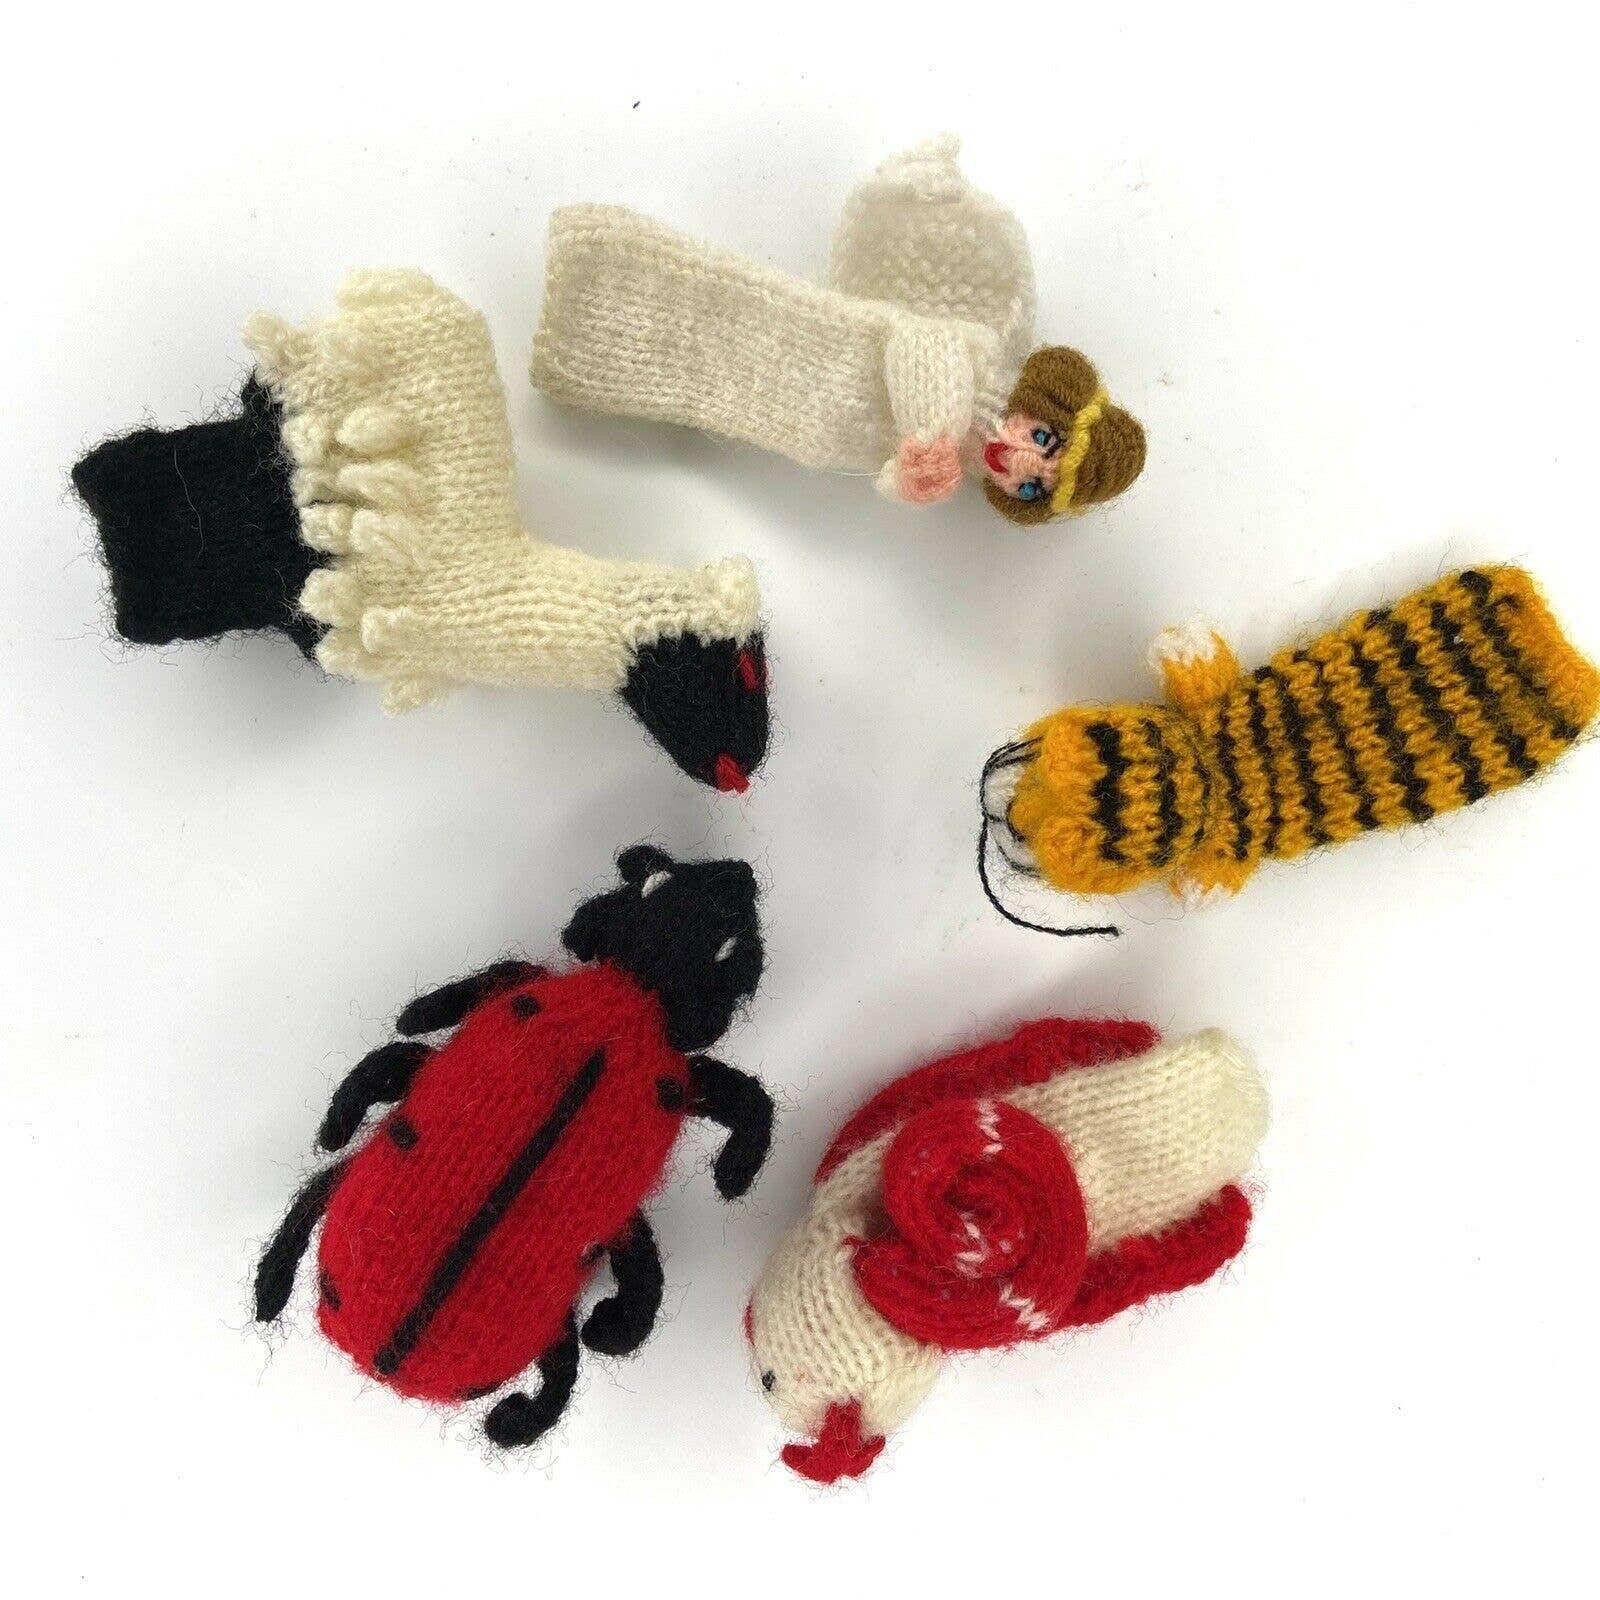 Peruvian Wool Finger Puppets Toys 5 PCS